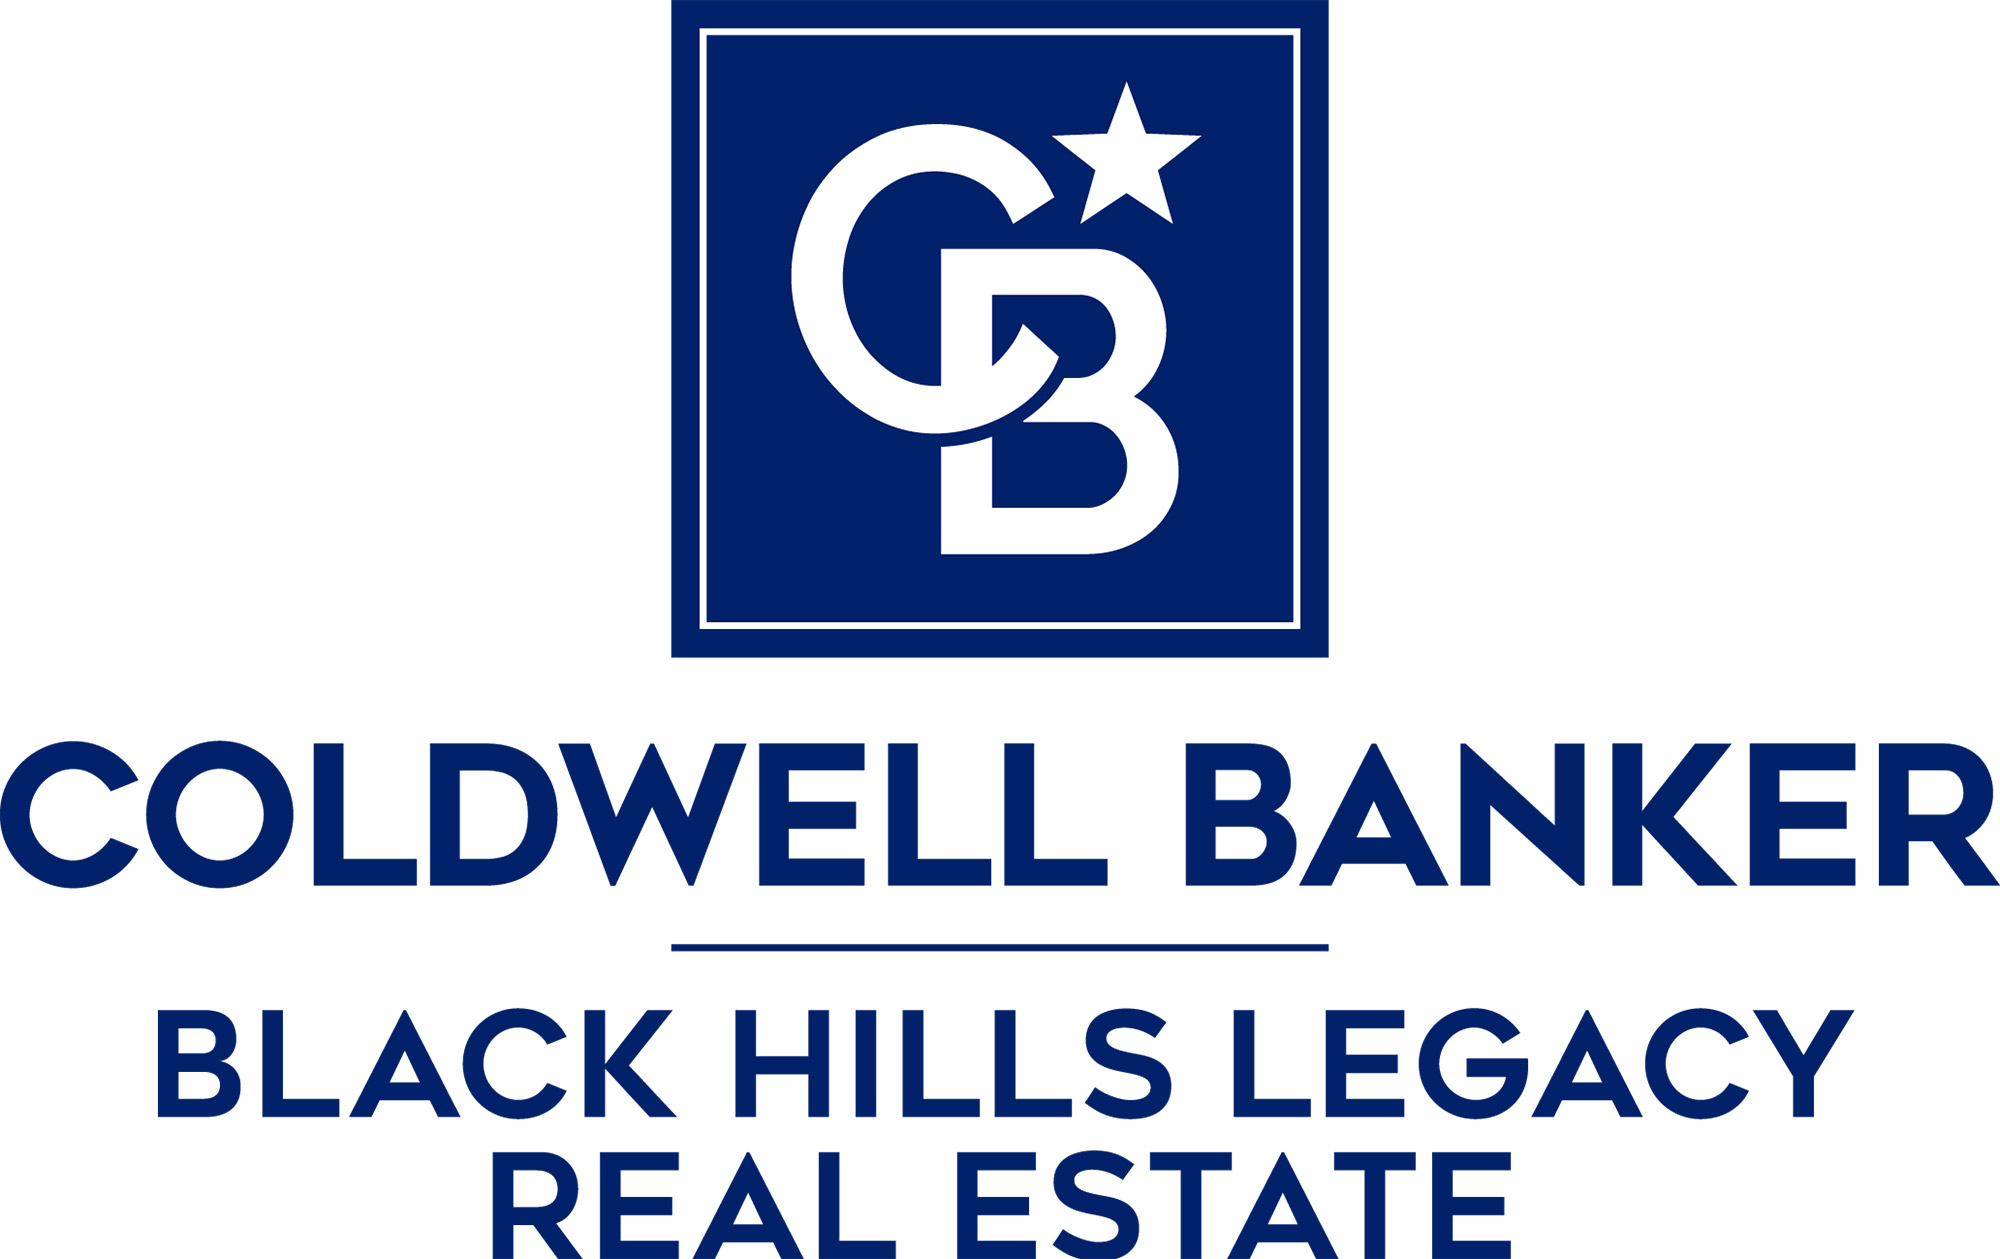 Rapid City and Black Hills Real Estate Market Report for September 2021